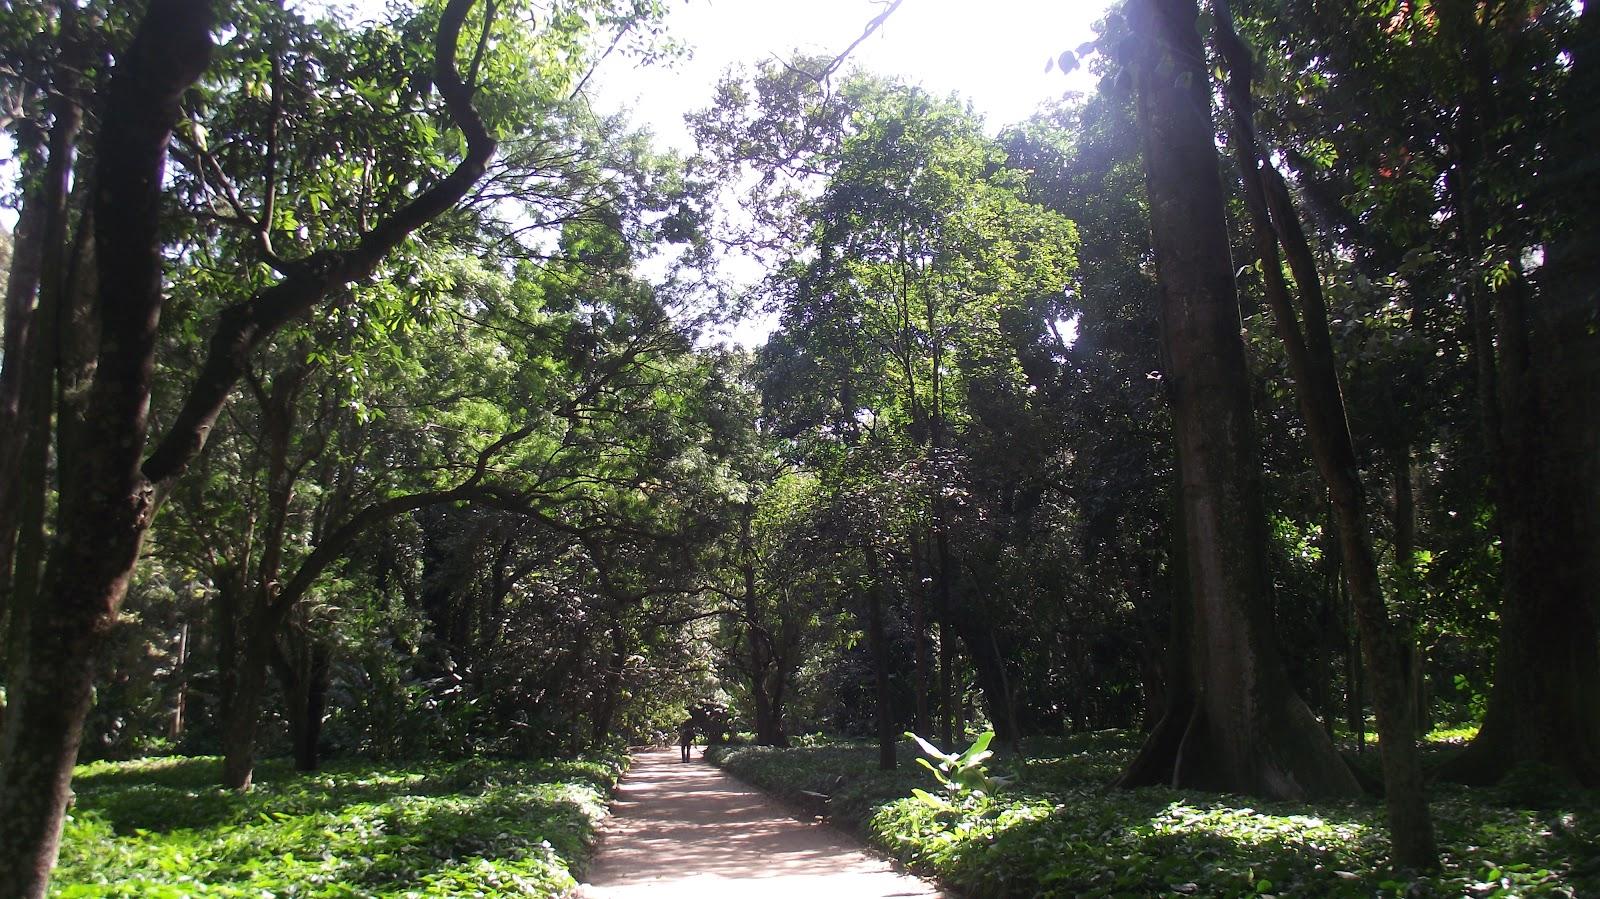 imagens jardins maravilhosos : Datoonz.com = Imagens Jardins Maravilhosos ~ V?rias id?ias ...